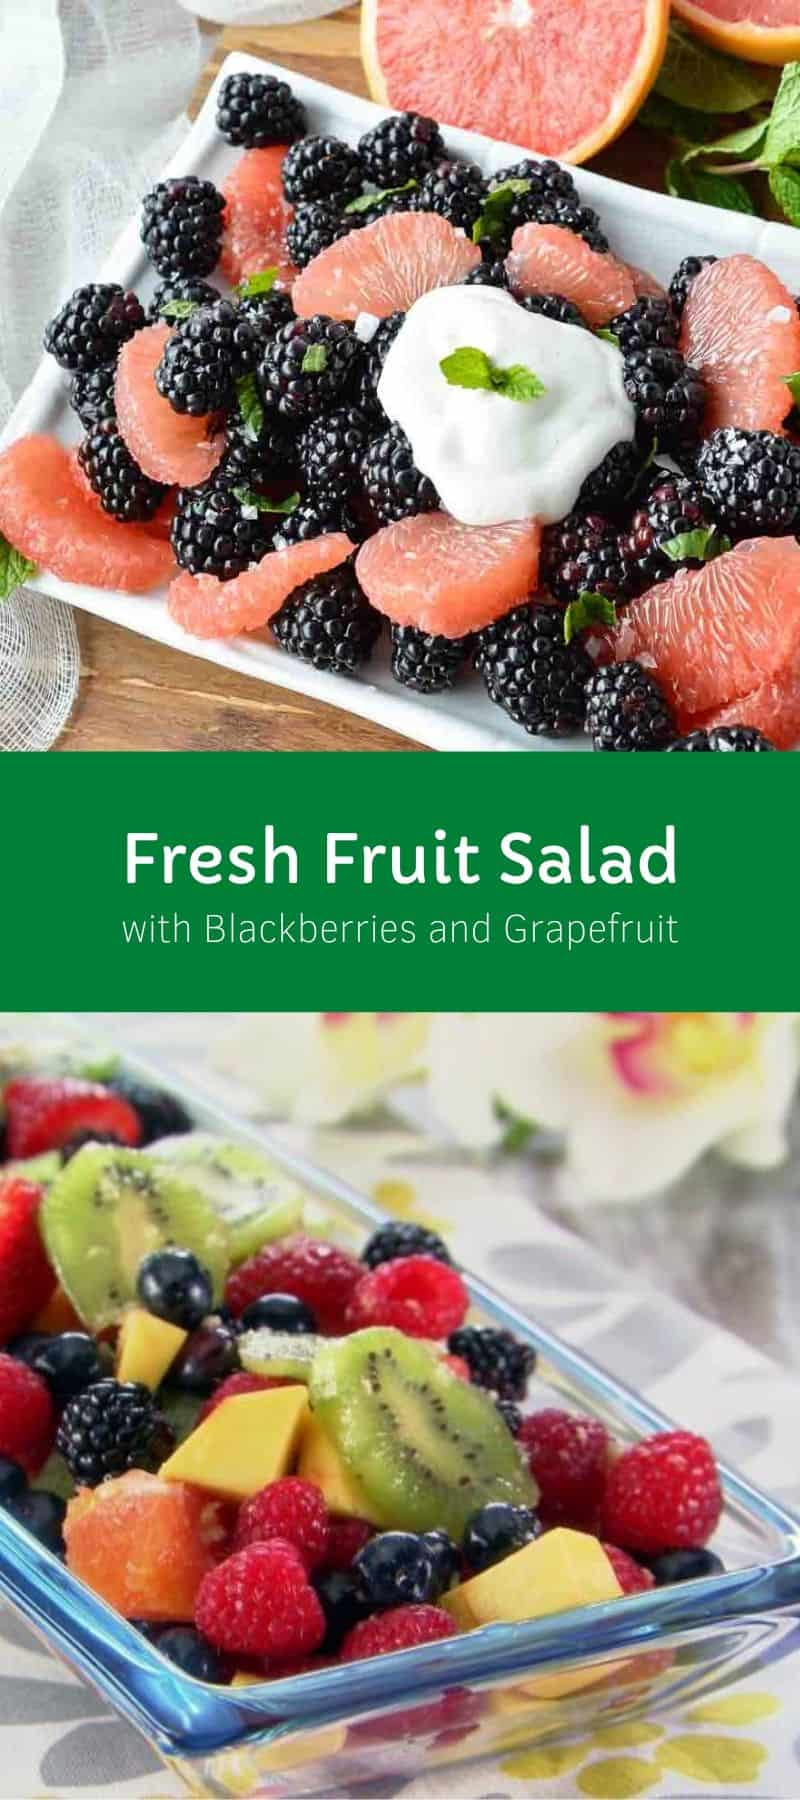 Fresh Fruit Salad with Blackberries and Grapefruit